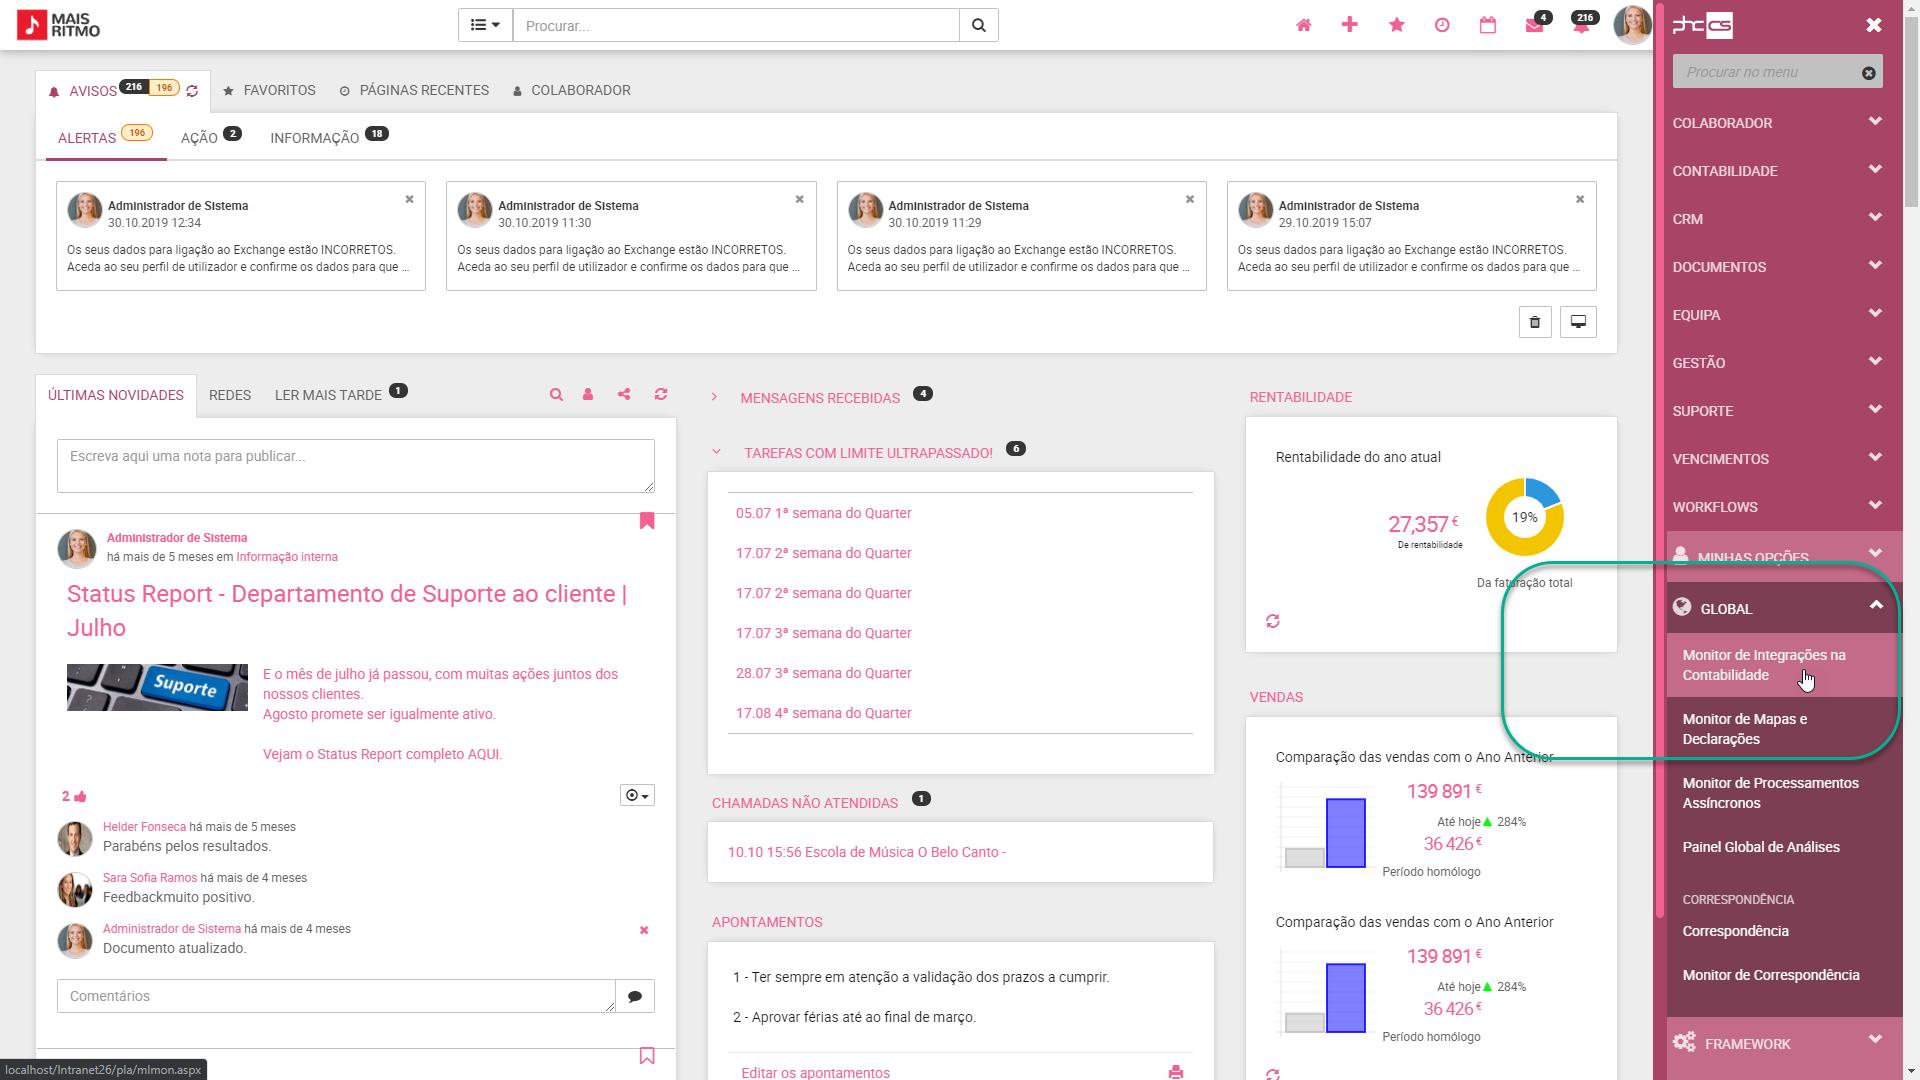 Monitor_Assistente_Integracoes_Contabilidade_vencimentos_web1